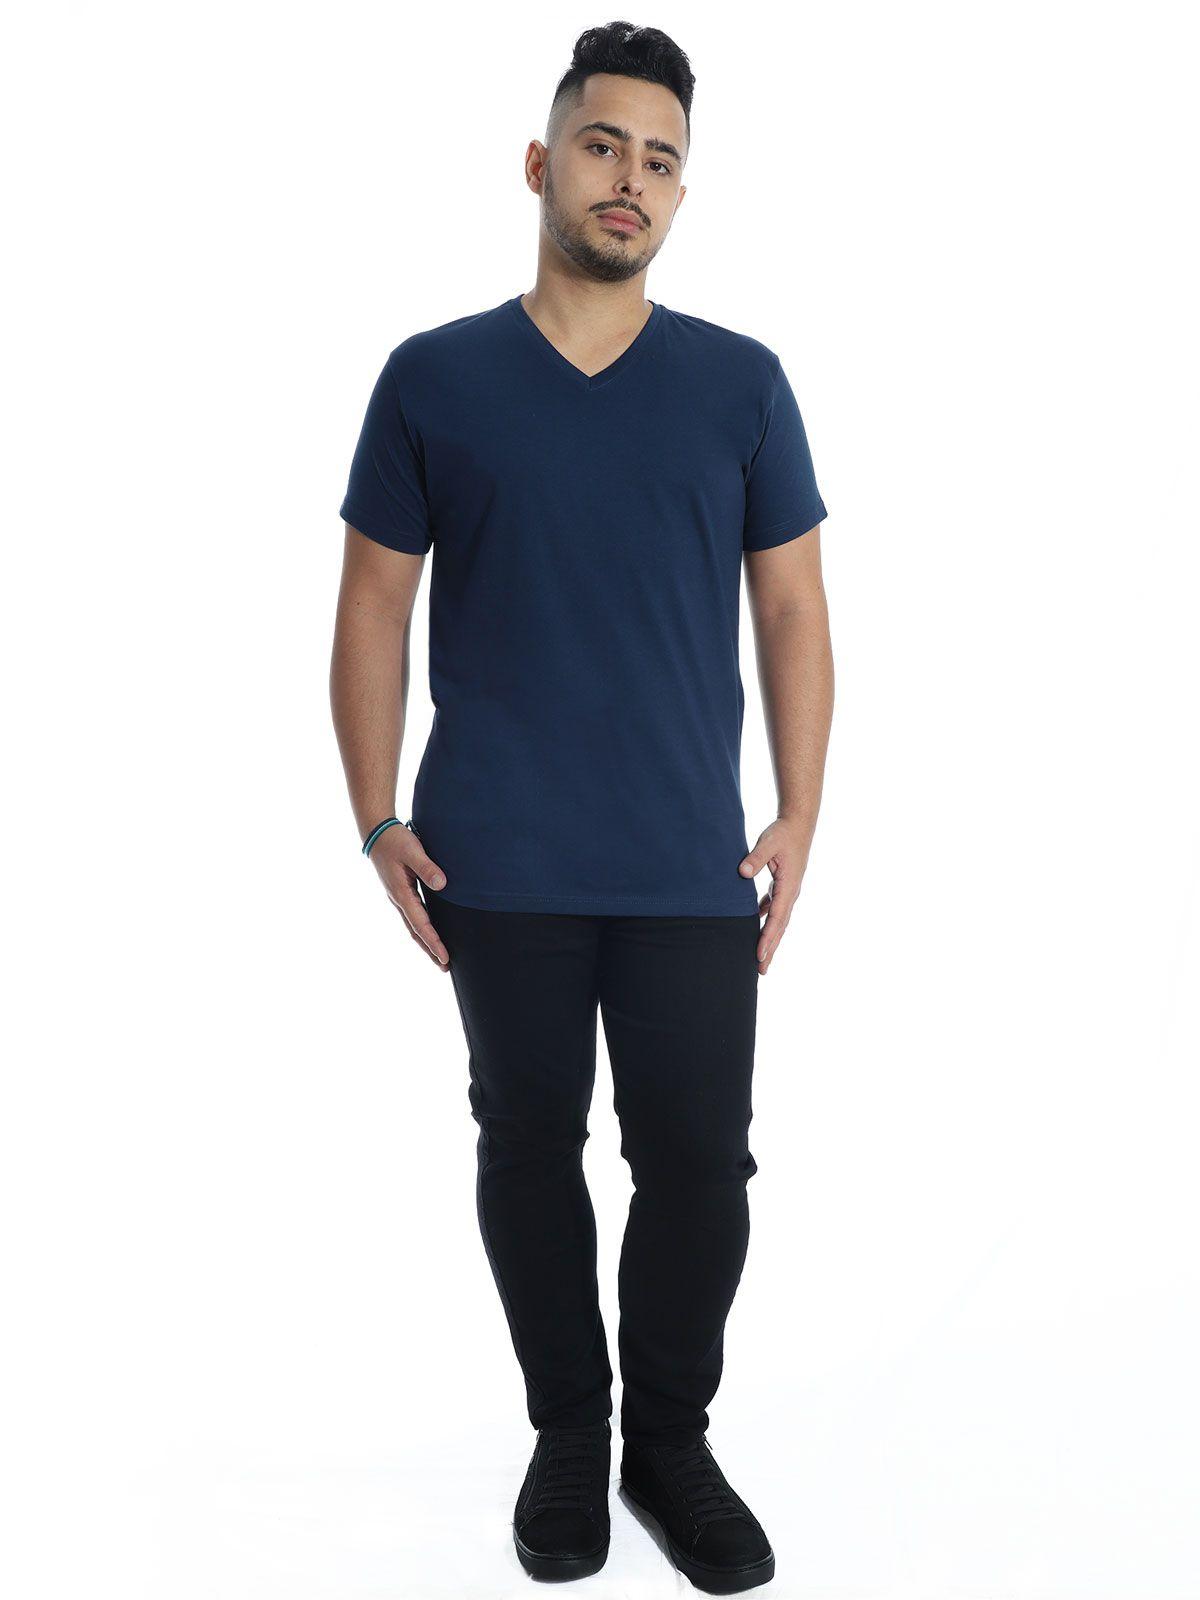 Camiseta Anistia Slim Fit Decote V. Lisa Marinho